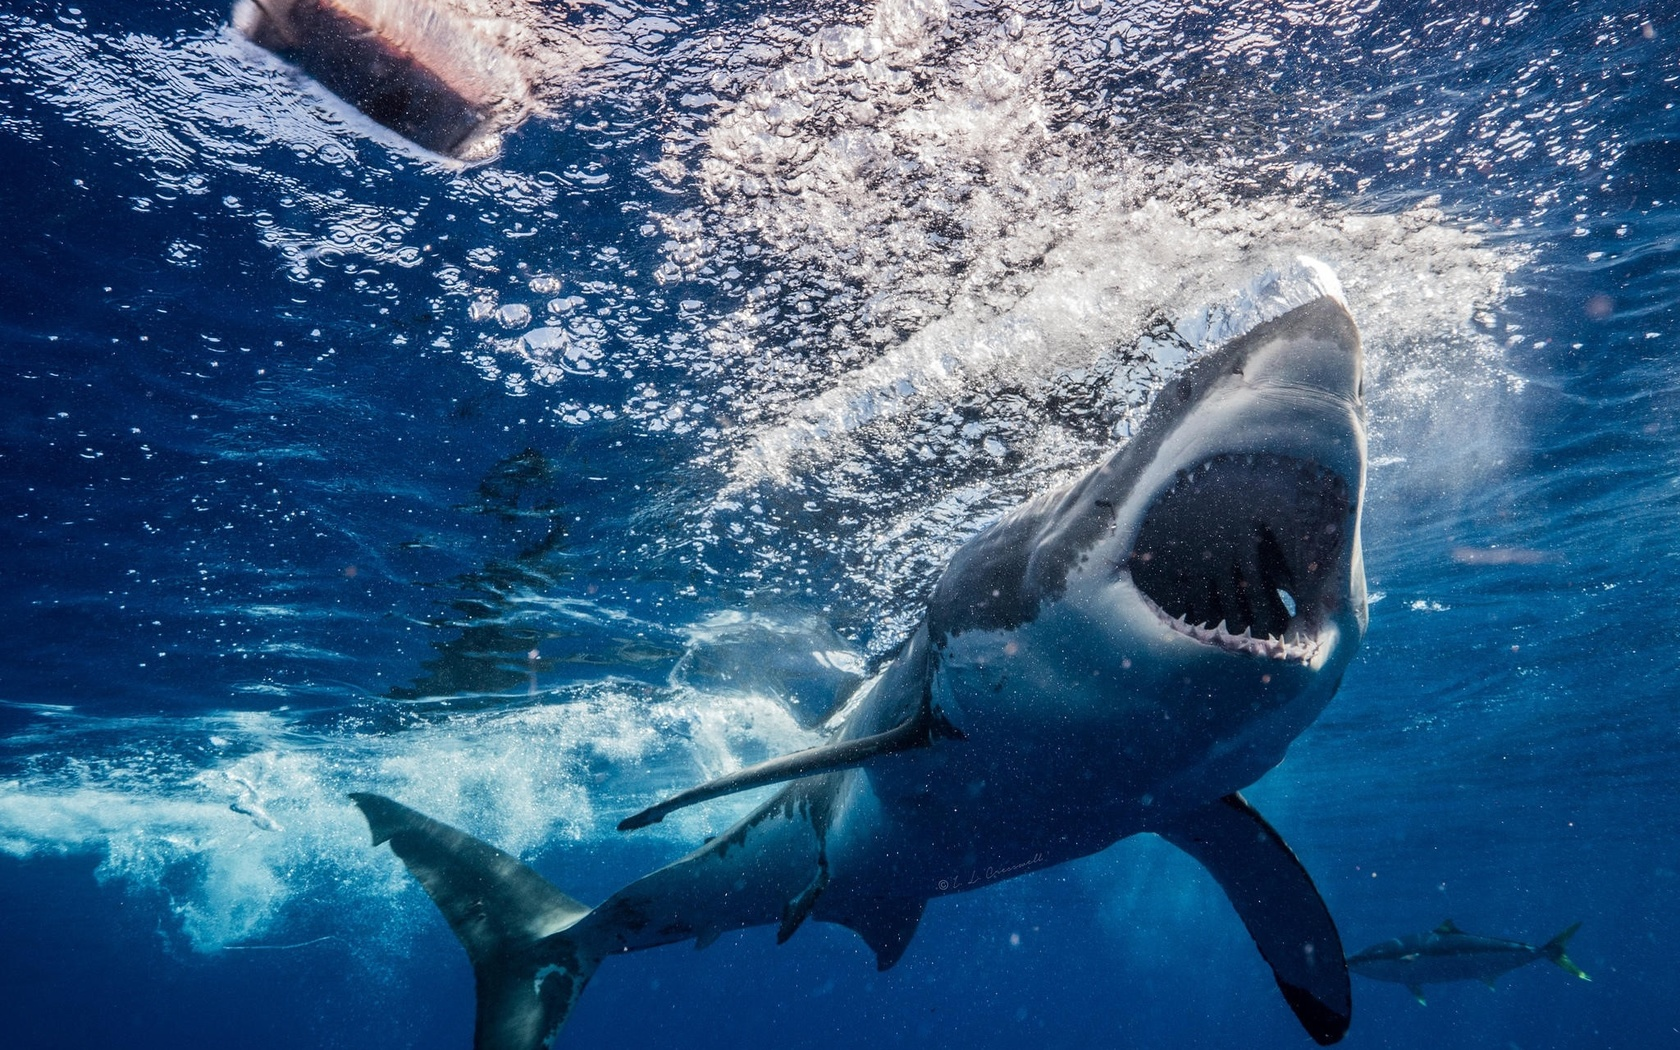 белая акула, хищник, рыба, акула, фото, под водой, тунец, приманка